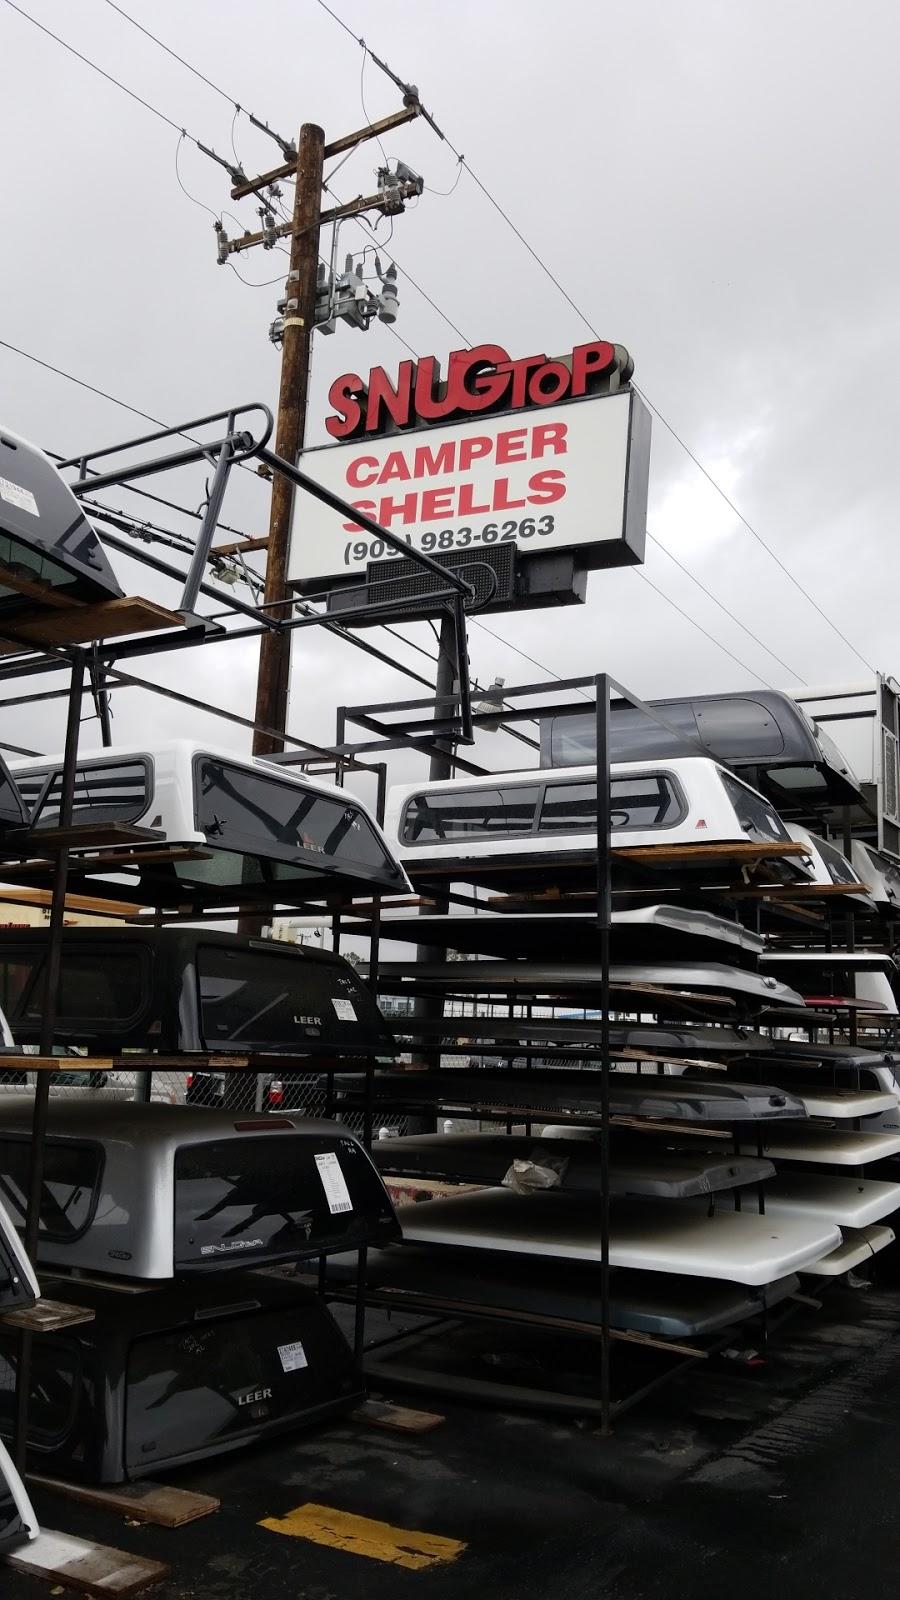 SNUGTOP California Camper Shells - car repair    Photo 2 of 10   Address: 828 W Holt Blvd, Ontario, CA 91762, USA   Phone: (909) 983-6263